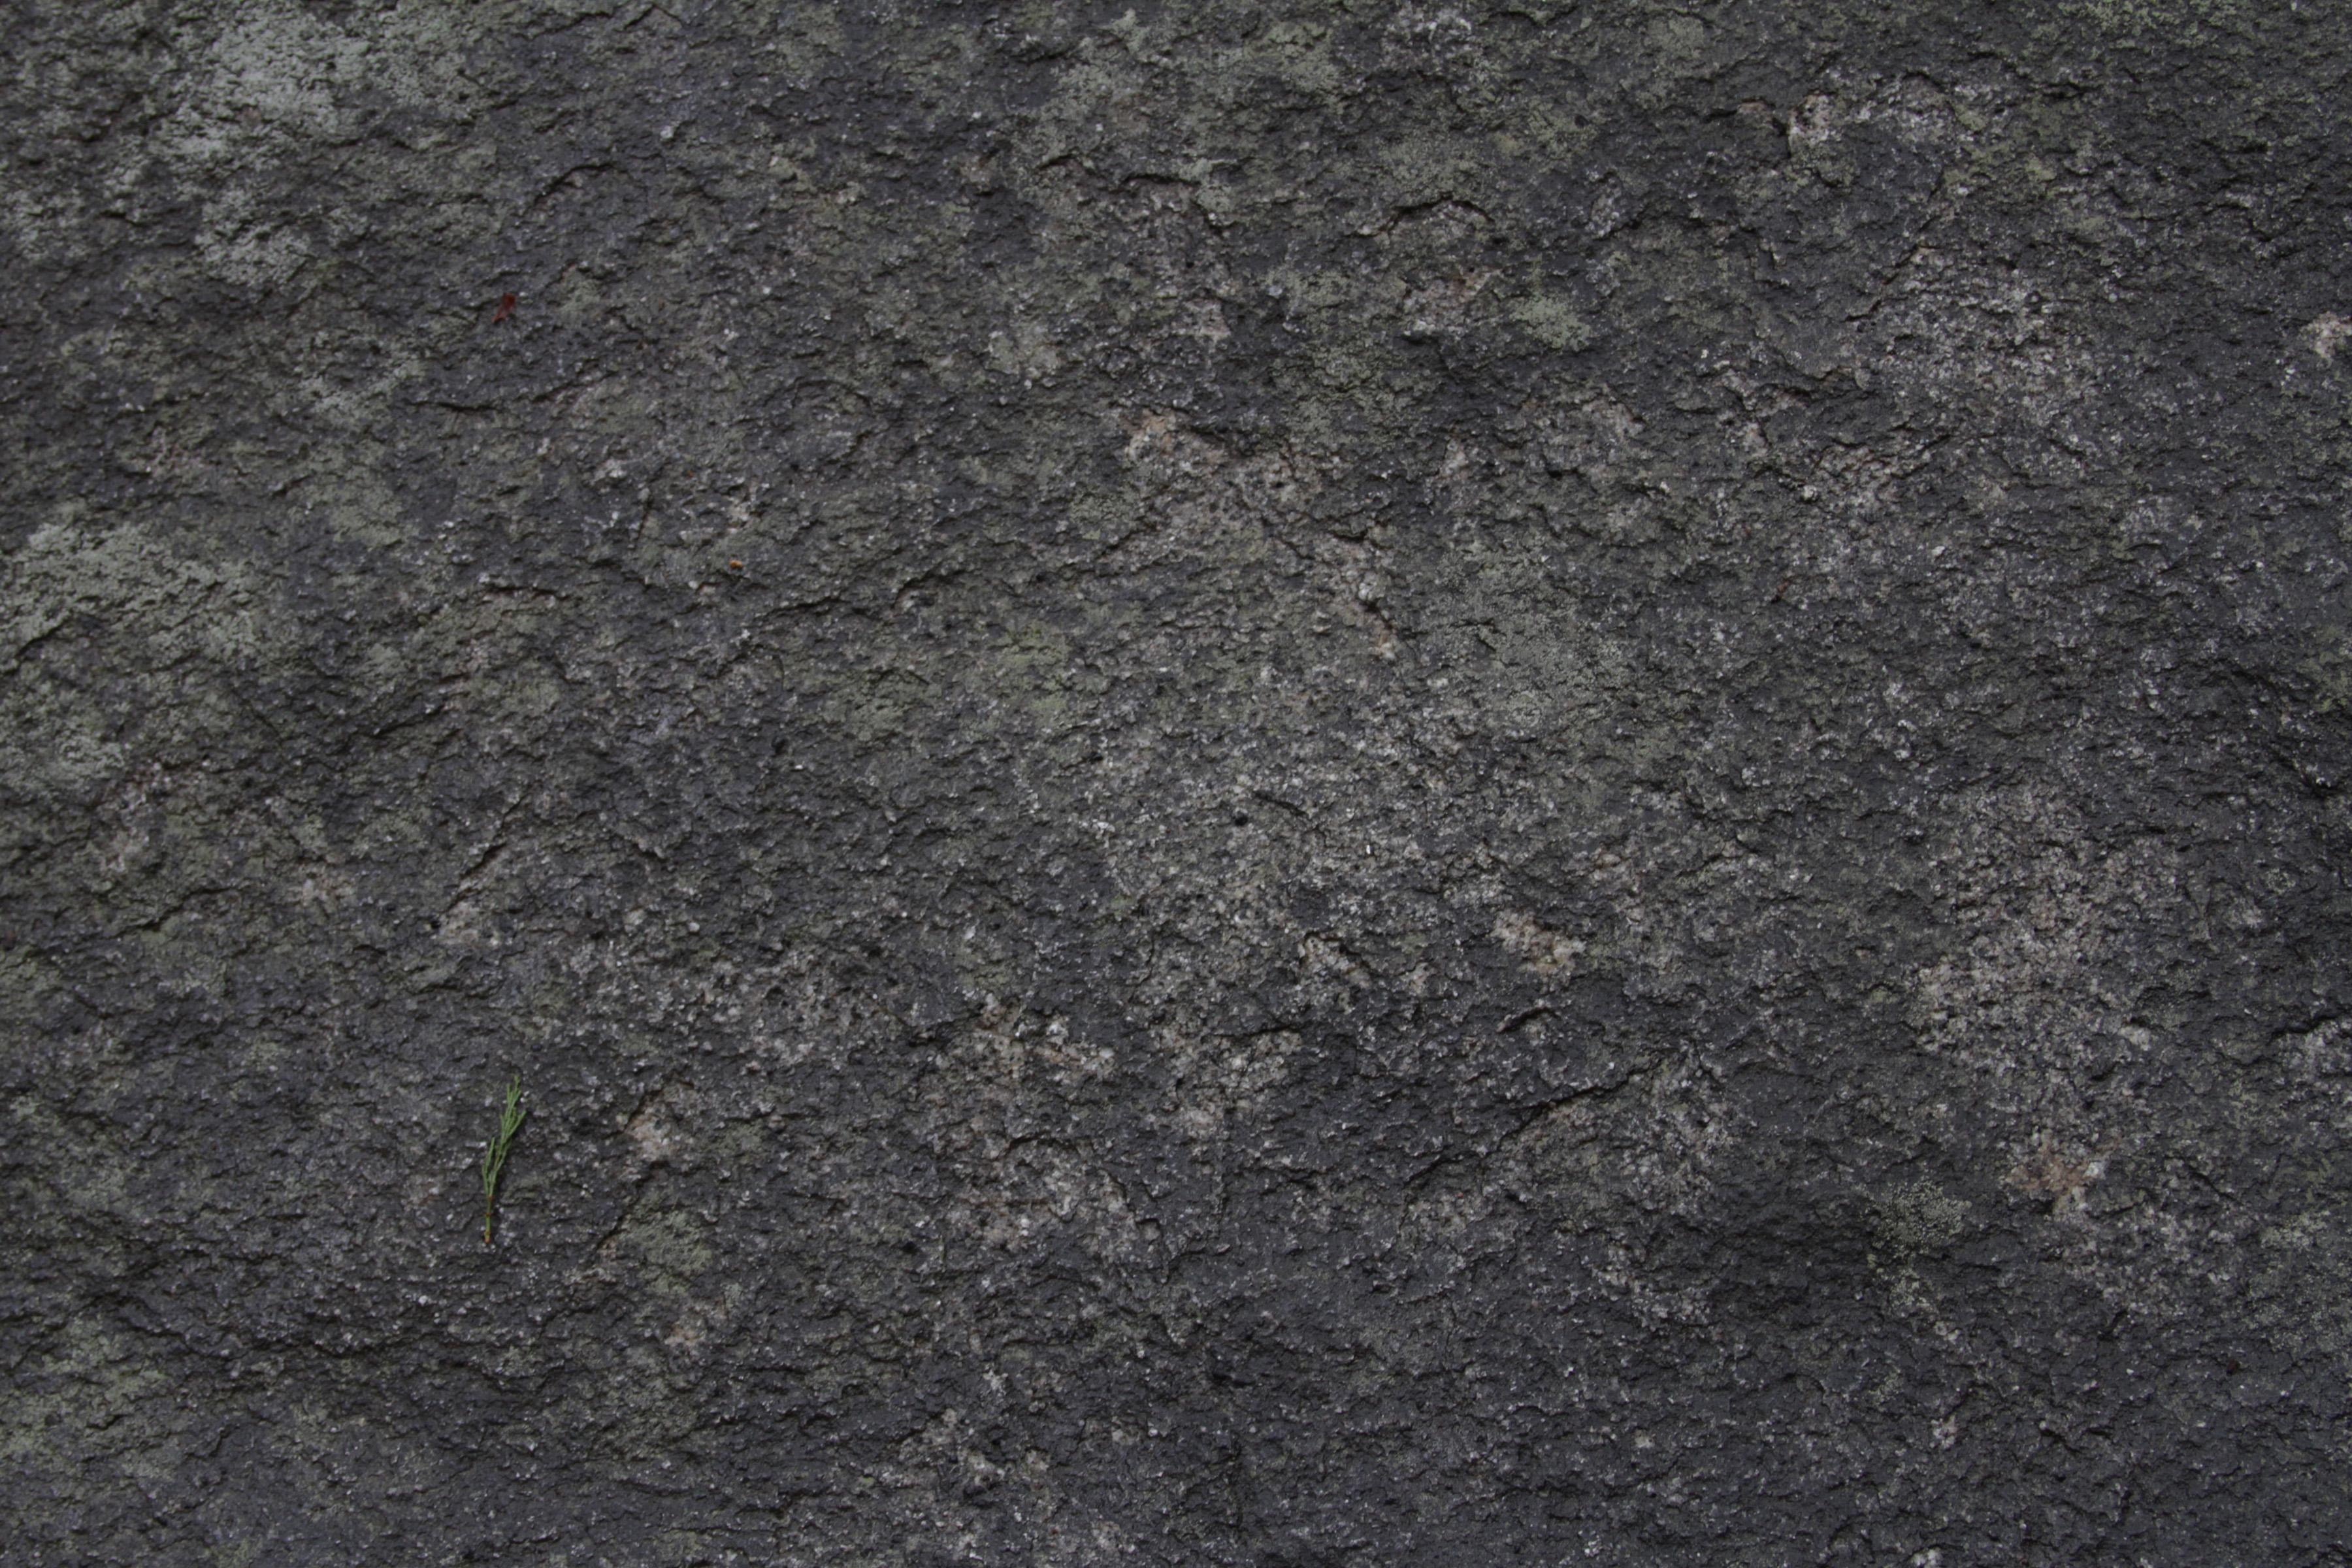 Black Stone Texture On Dark Stone Texture Free Photo Surface Texture Uneven